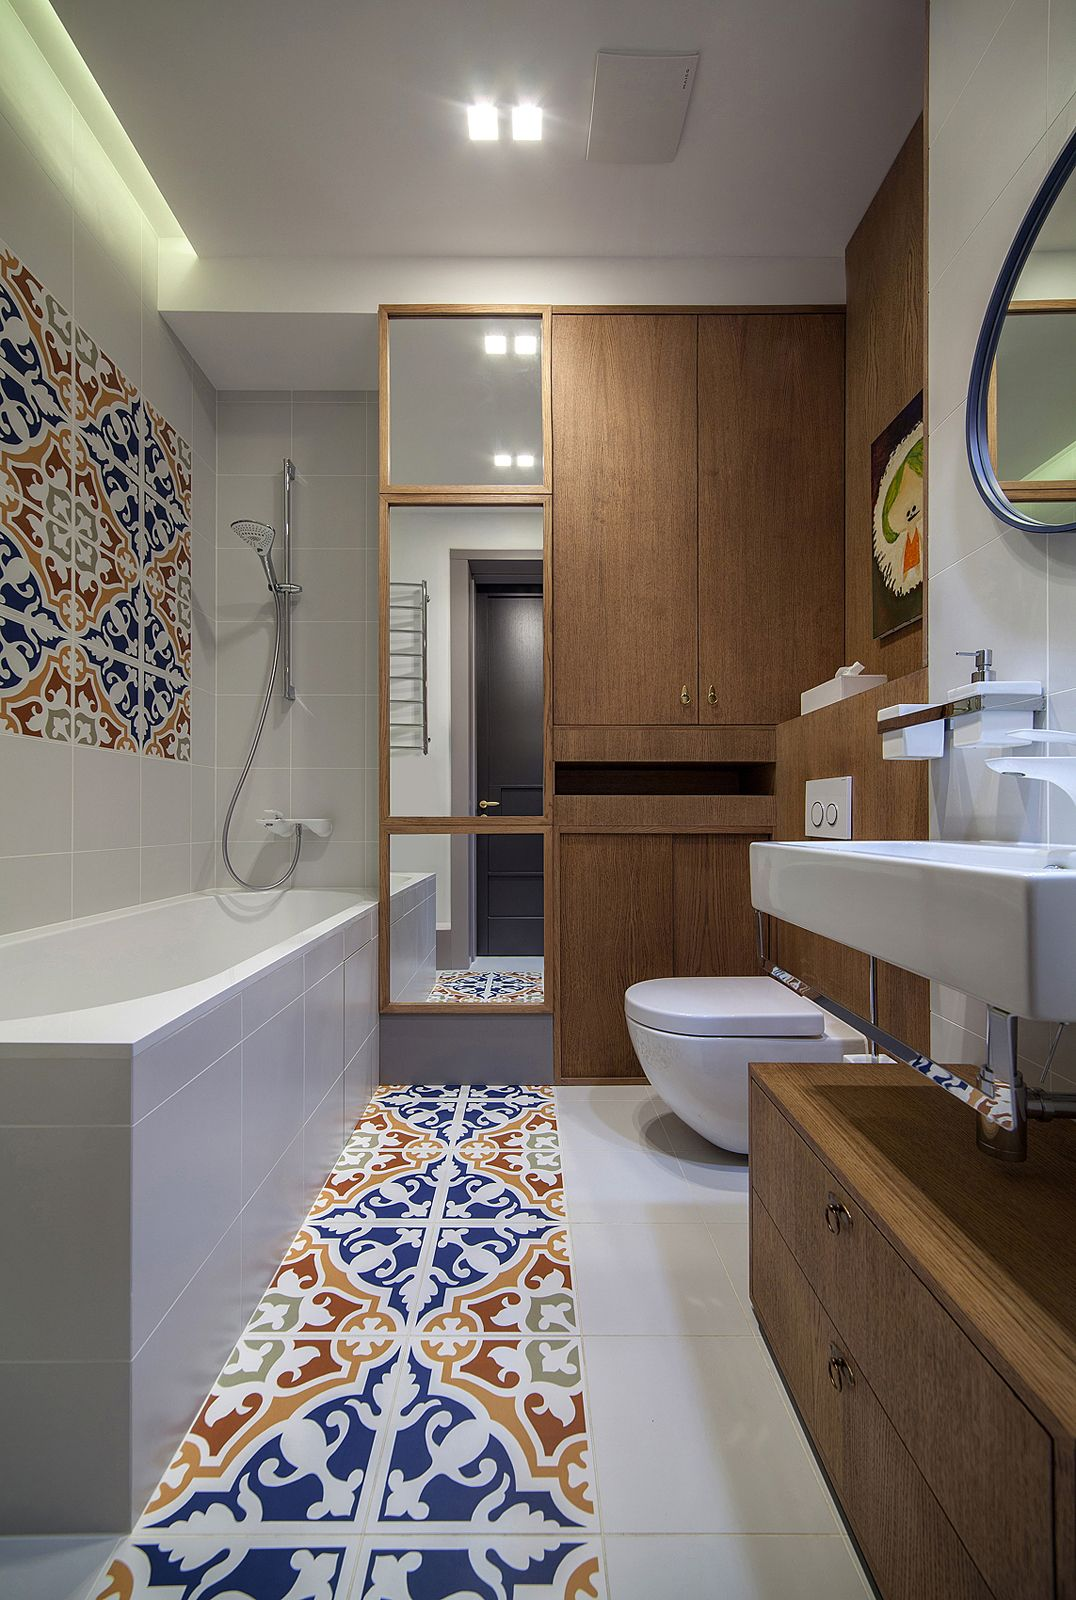 Contemporary chic decor - Kiev Apartment With Colourful Accents And Contemporary Chic Decor